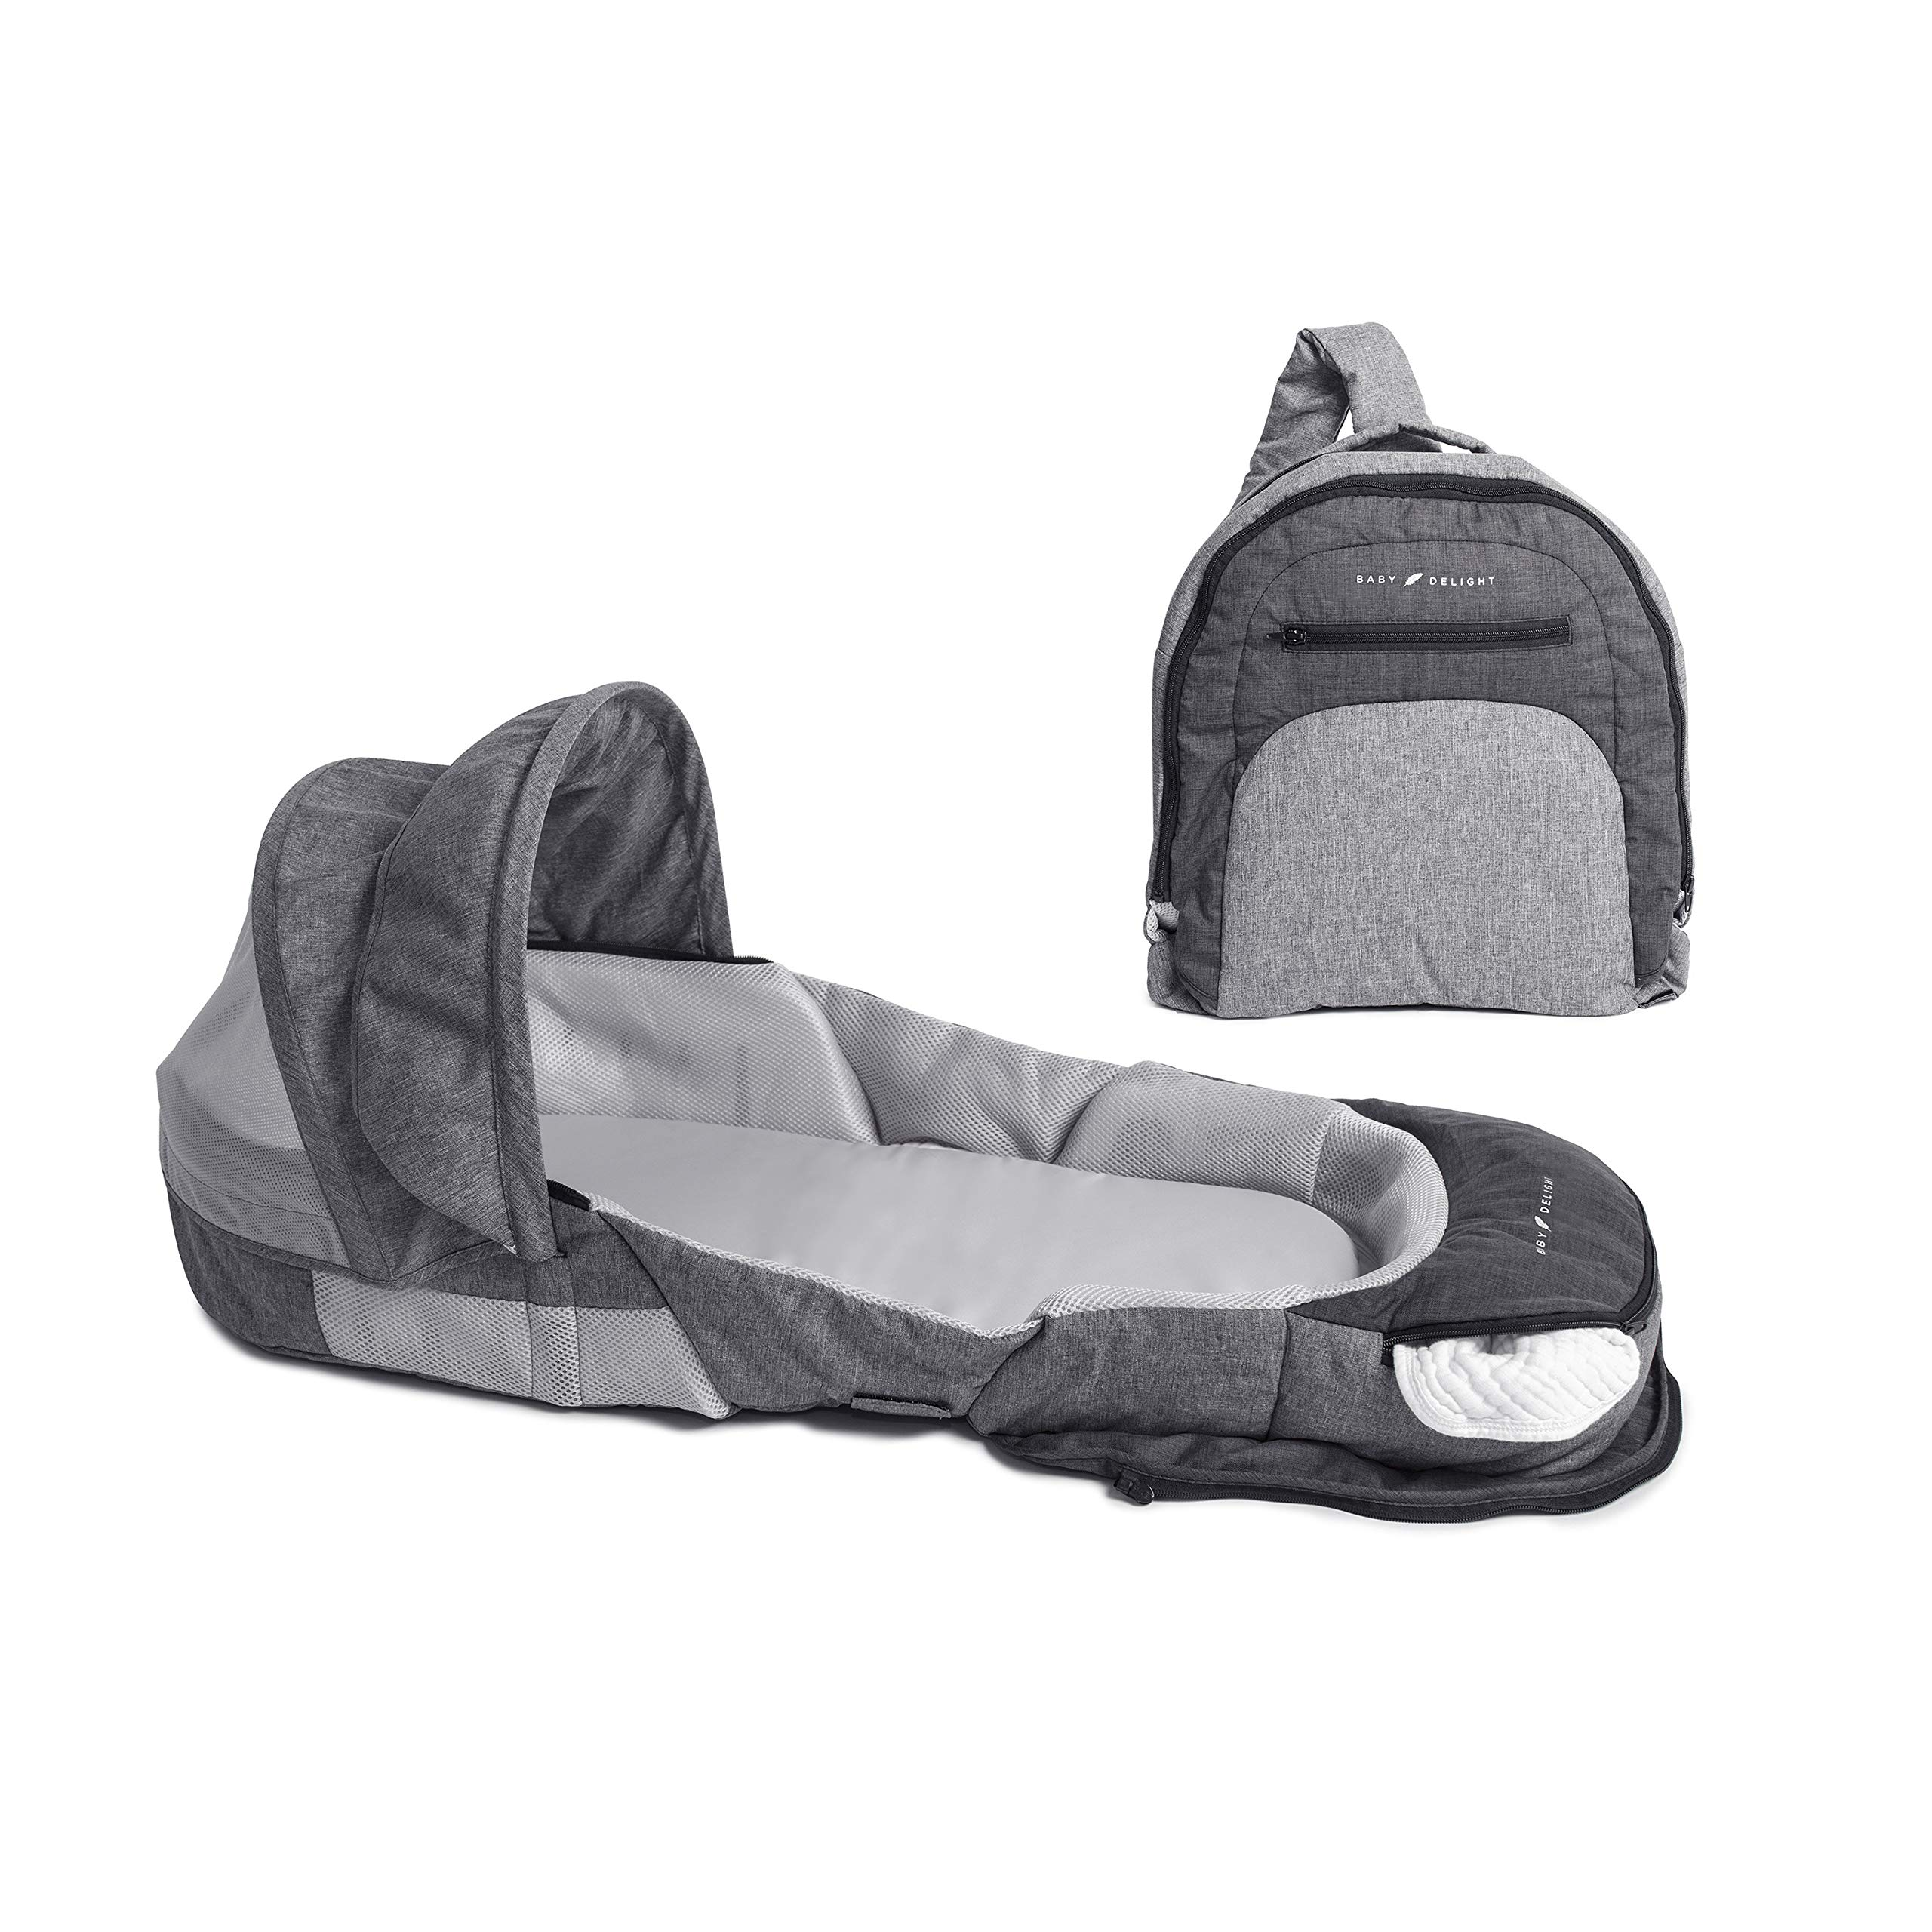 Pleasing Best Rated In Nursery Travel Beds Helpful Customer Reviews Lamtechconsult Wood Chair Design Ideas Lamtechconsultcom